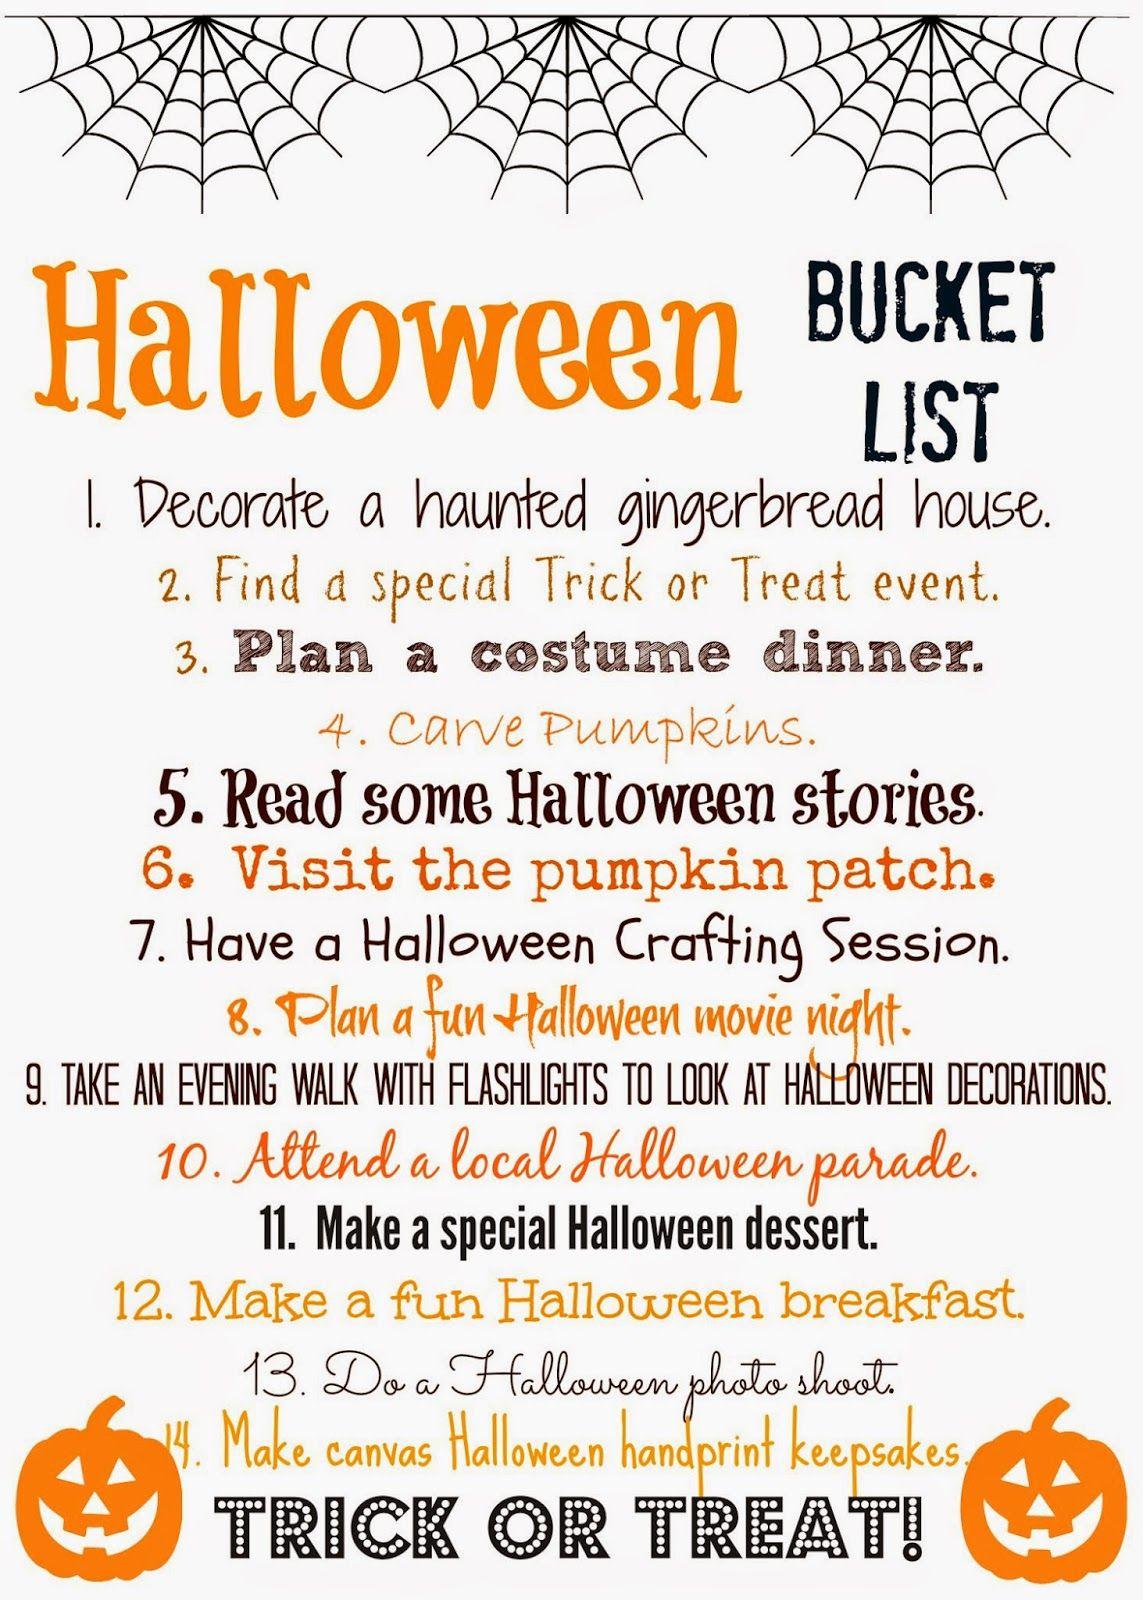 halloween bucket list (free printable | ☆lets do this